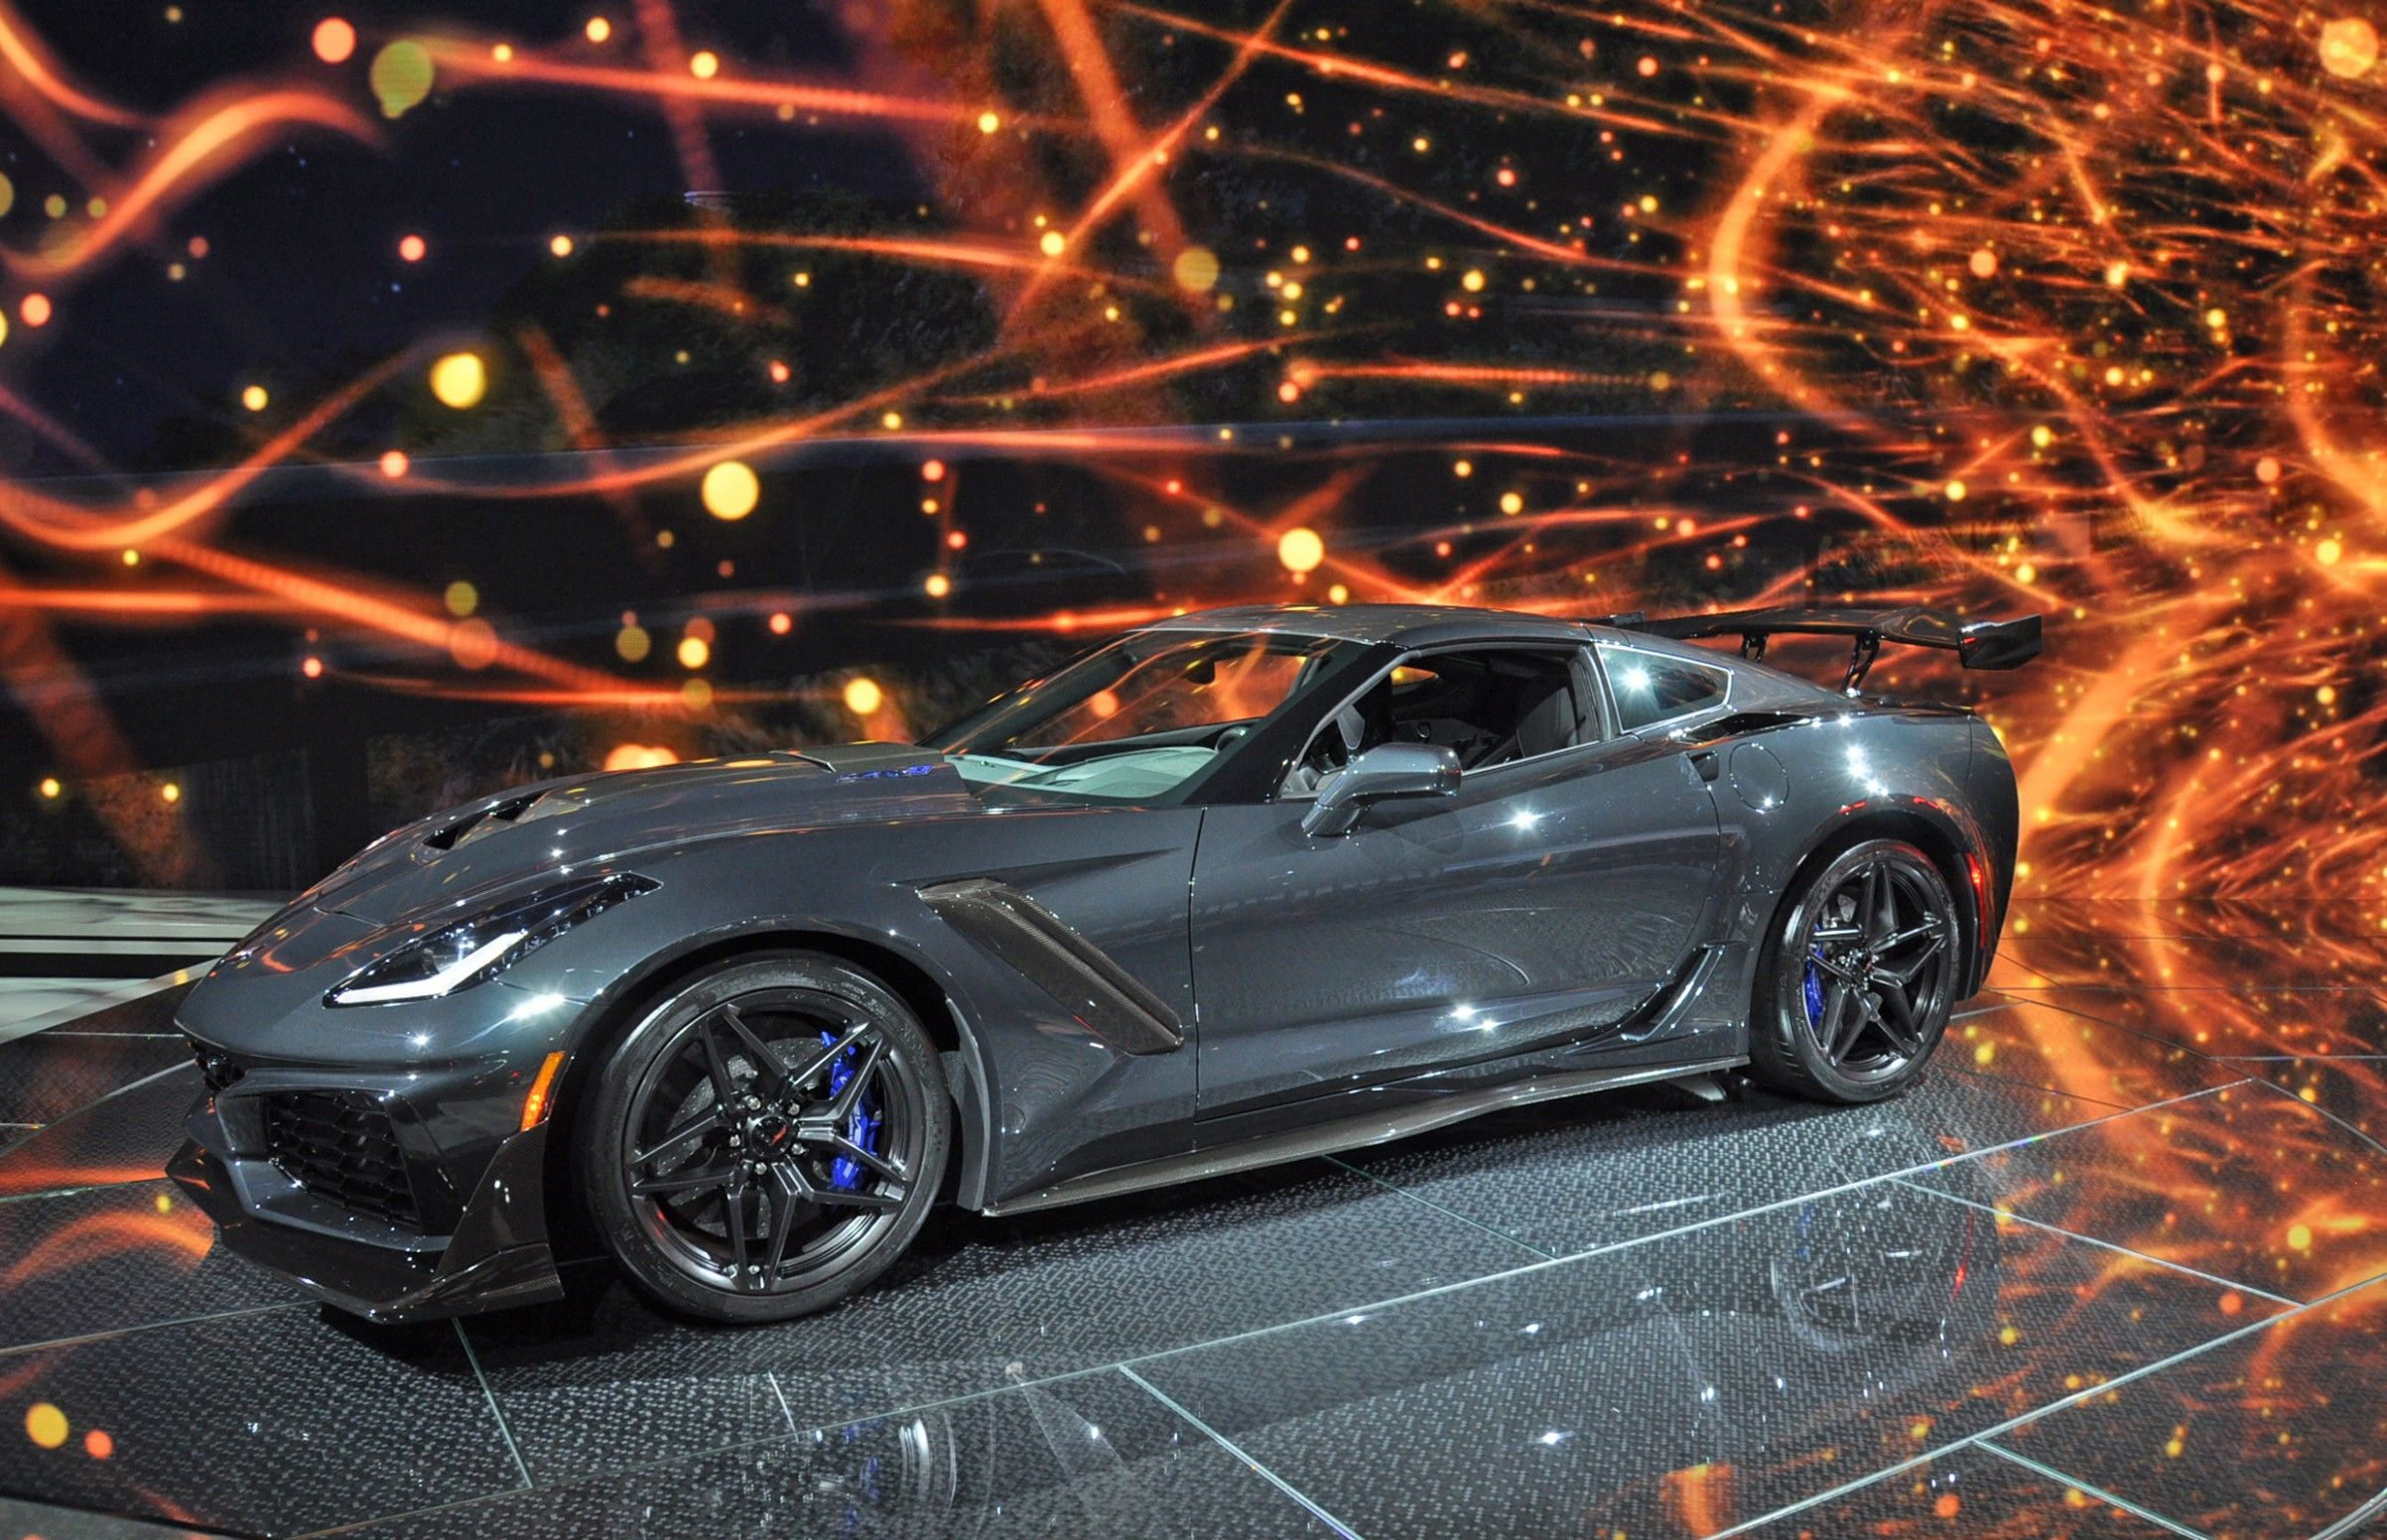 5 Features Of 2021 Chevrolet Corvette Zora Zr1 Design That Make Everyone Love It Chevrolet Corvette 2021 Corvette Corvette